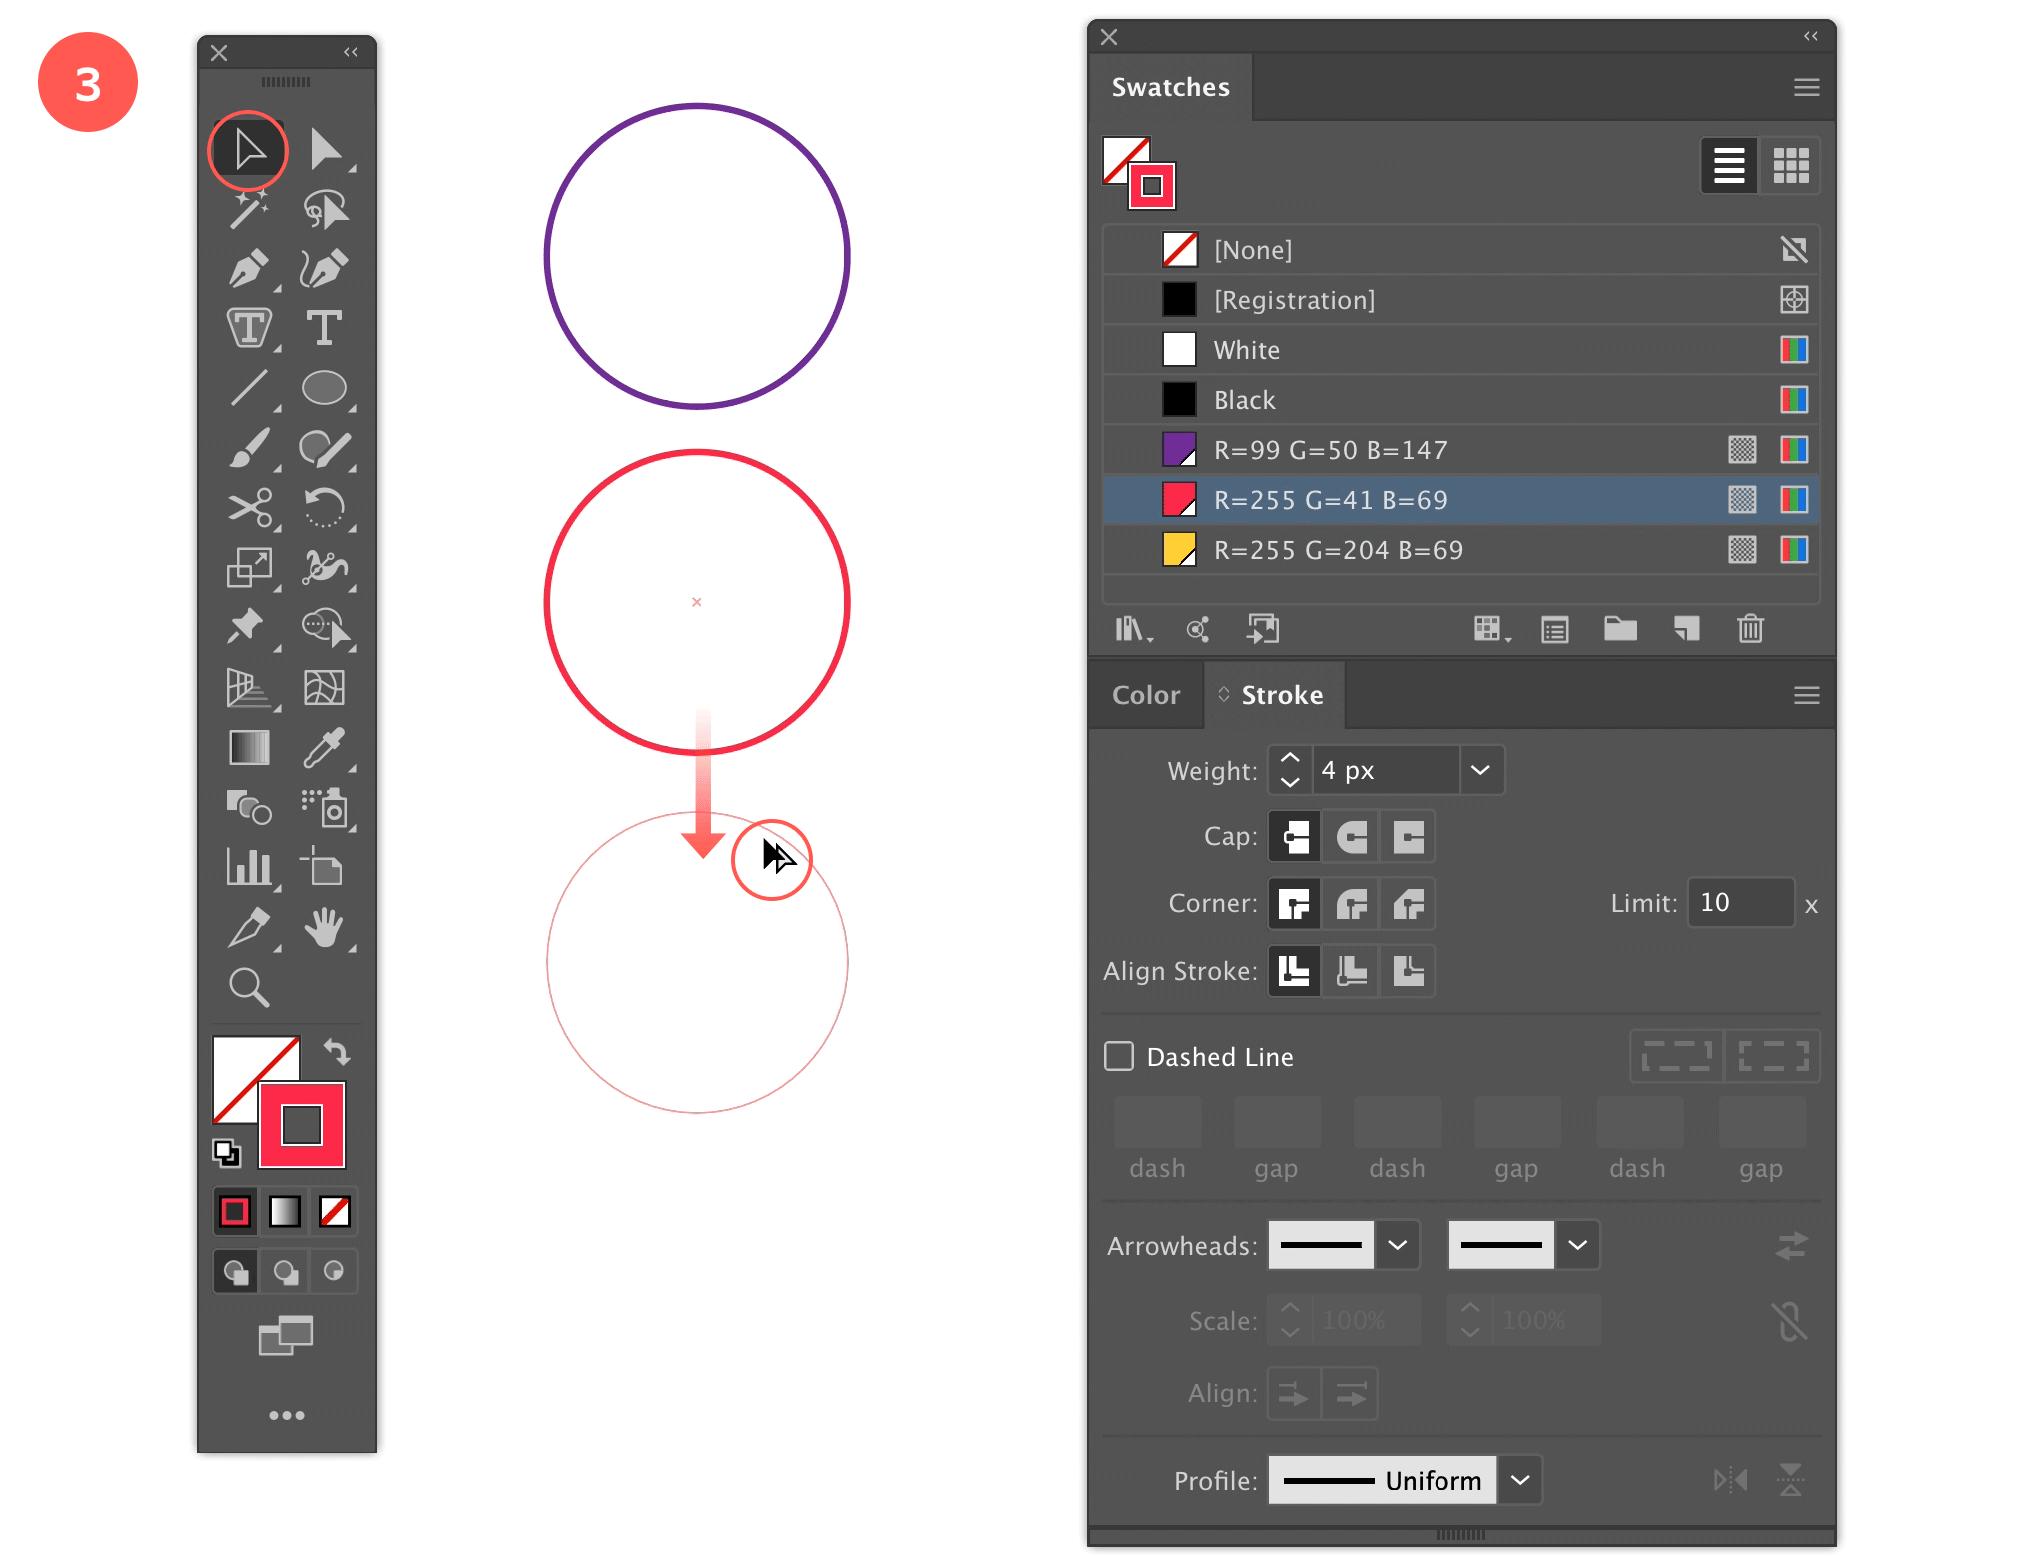 Step 3: Duplicate the Circle again